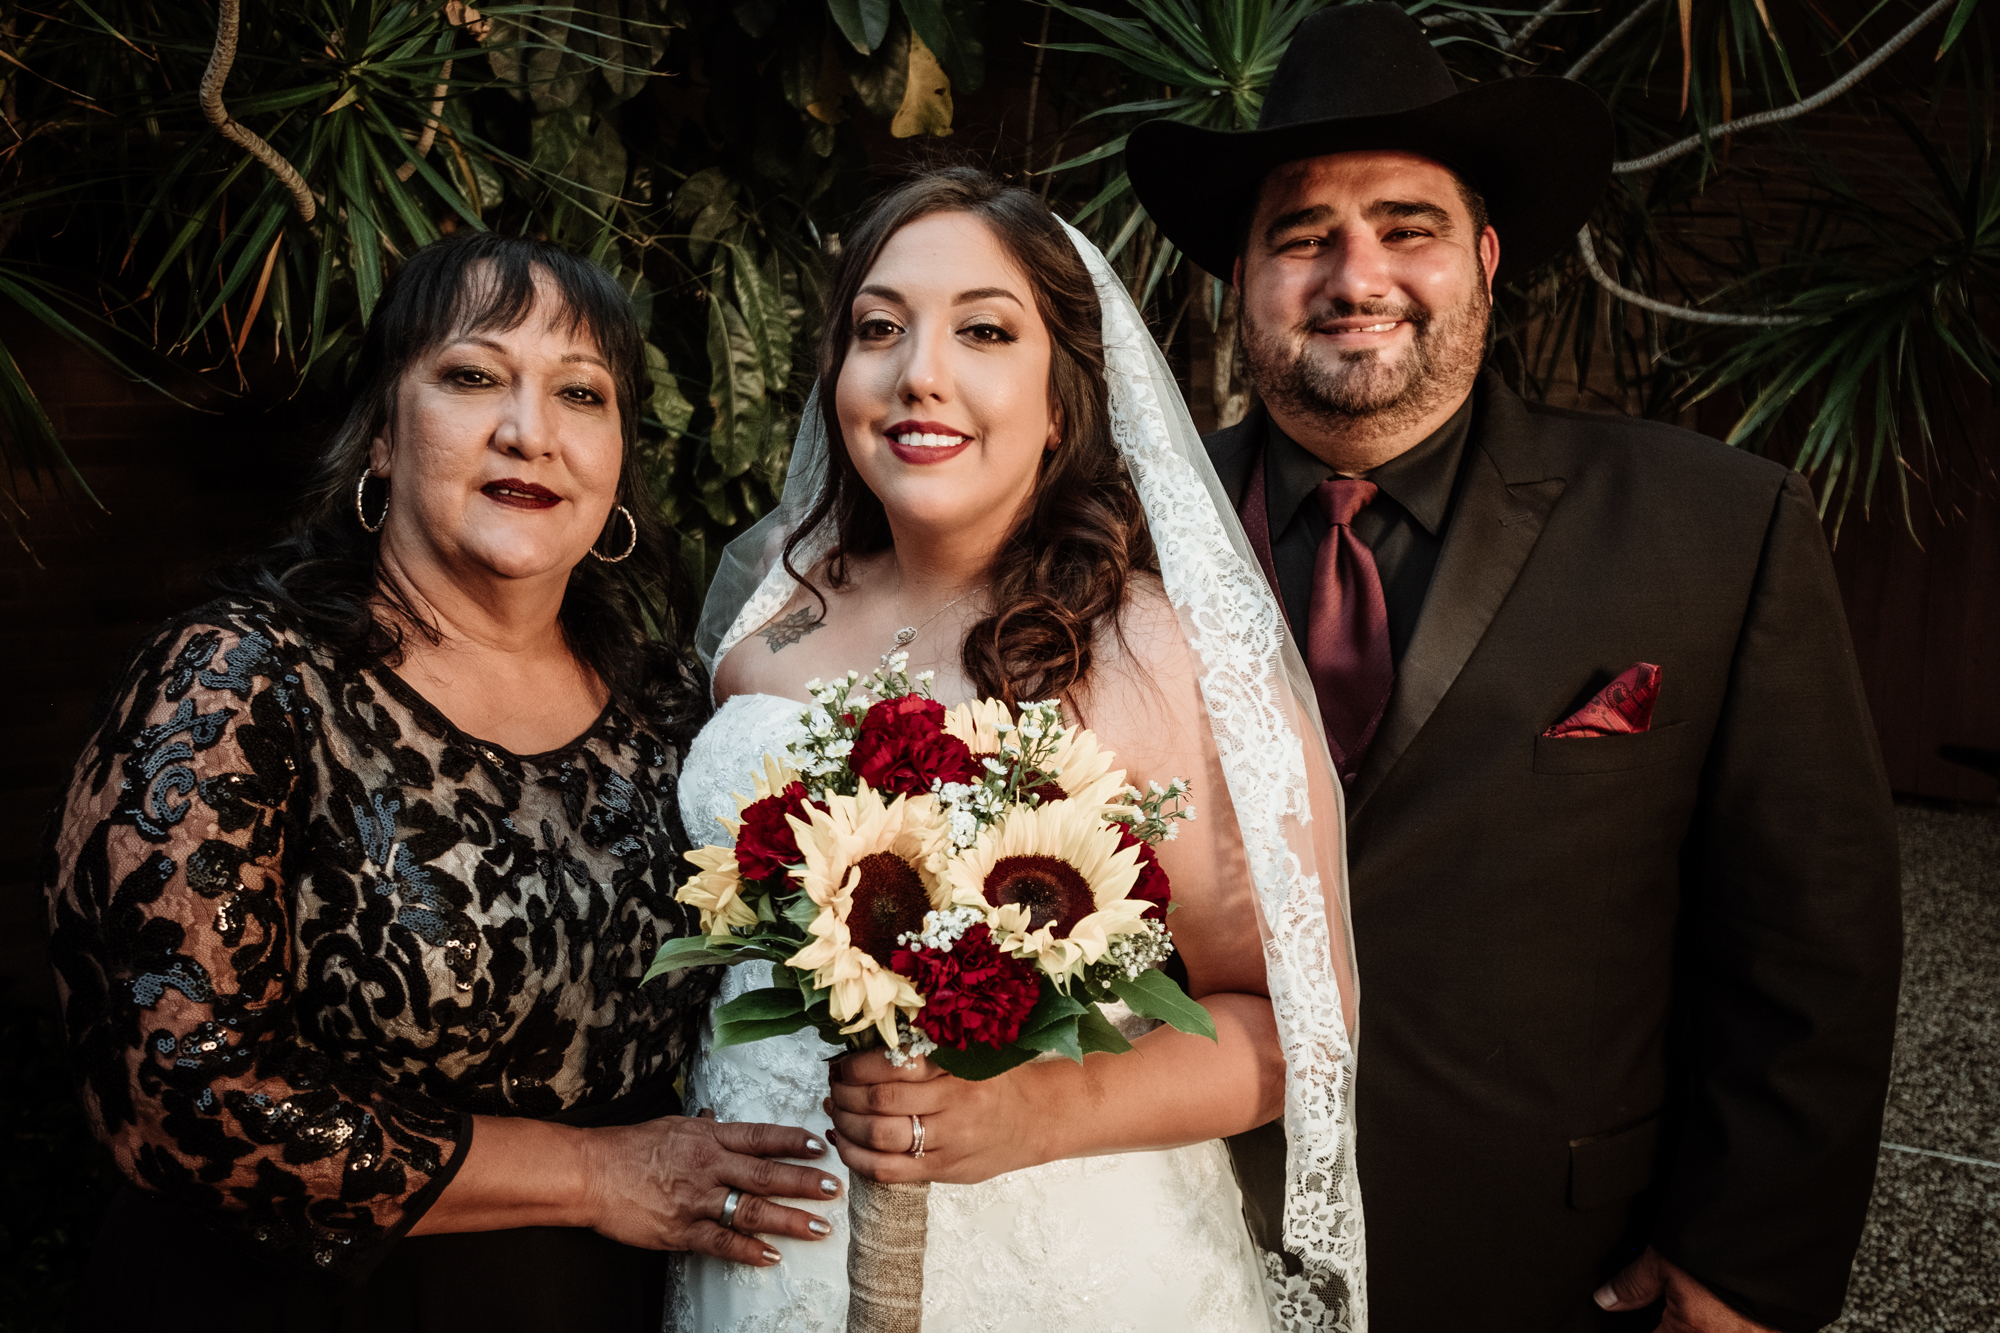 DallasAlyssa-Wedding-2019-JF-1113.jpg